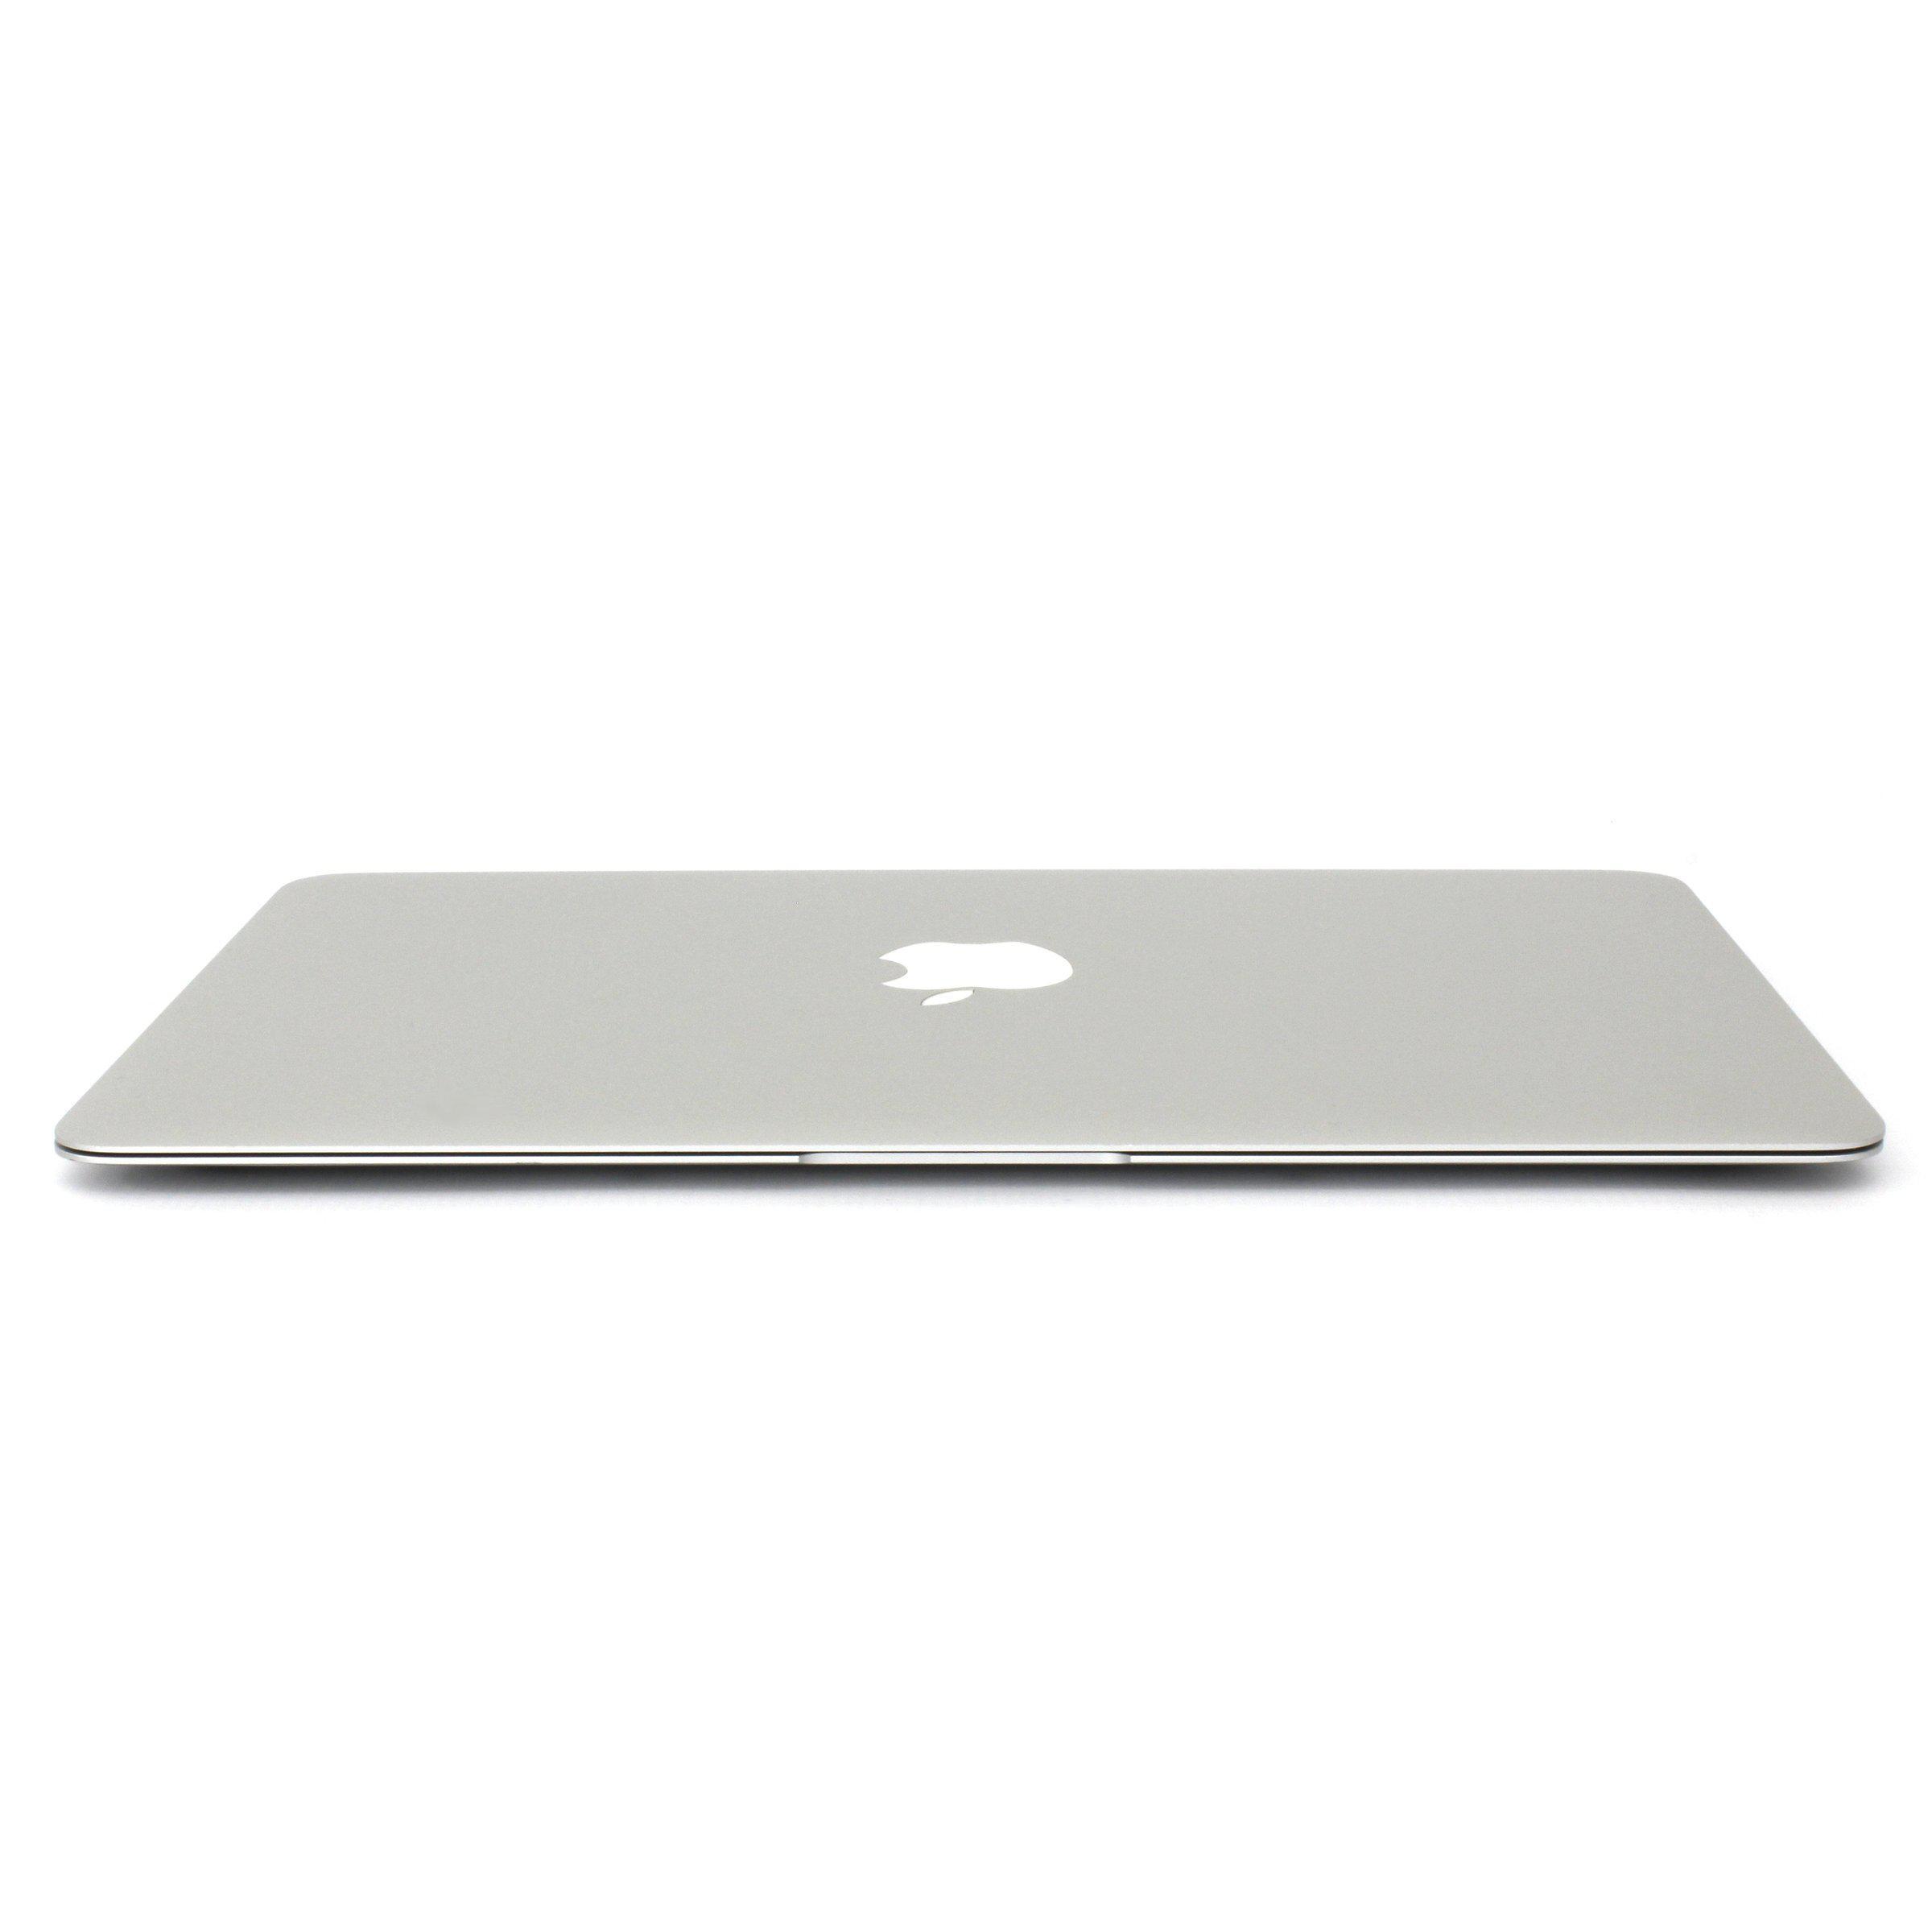 MacBook Air 11.6-inch (2015) - Core i5 - 4GB - SSD 120 GB QWERTY - English (US)